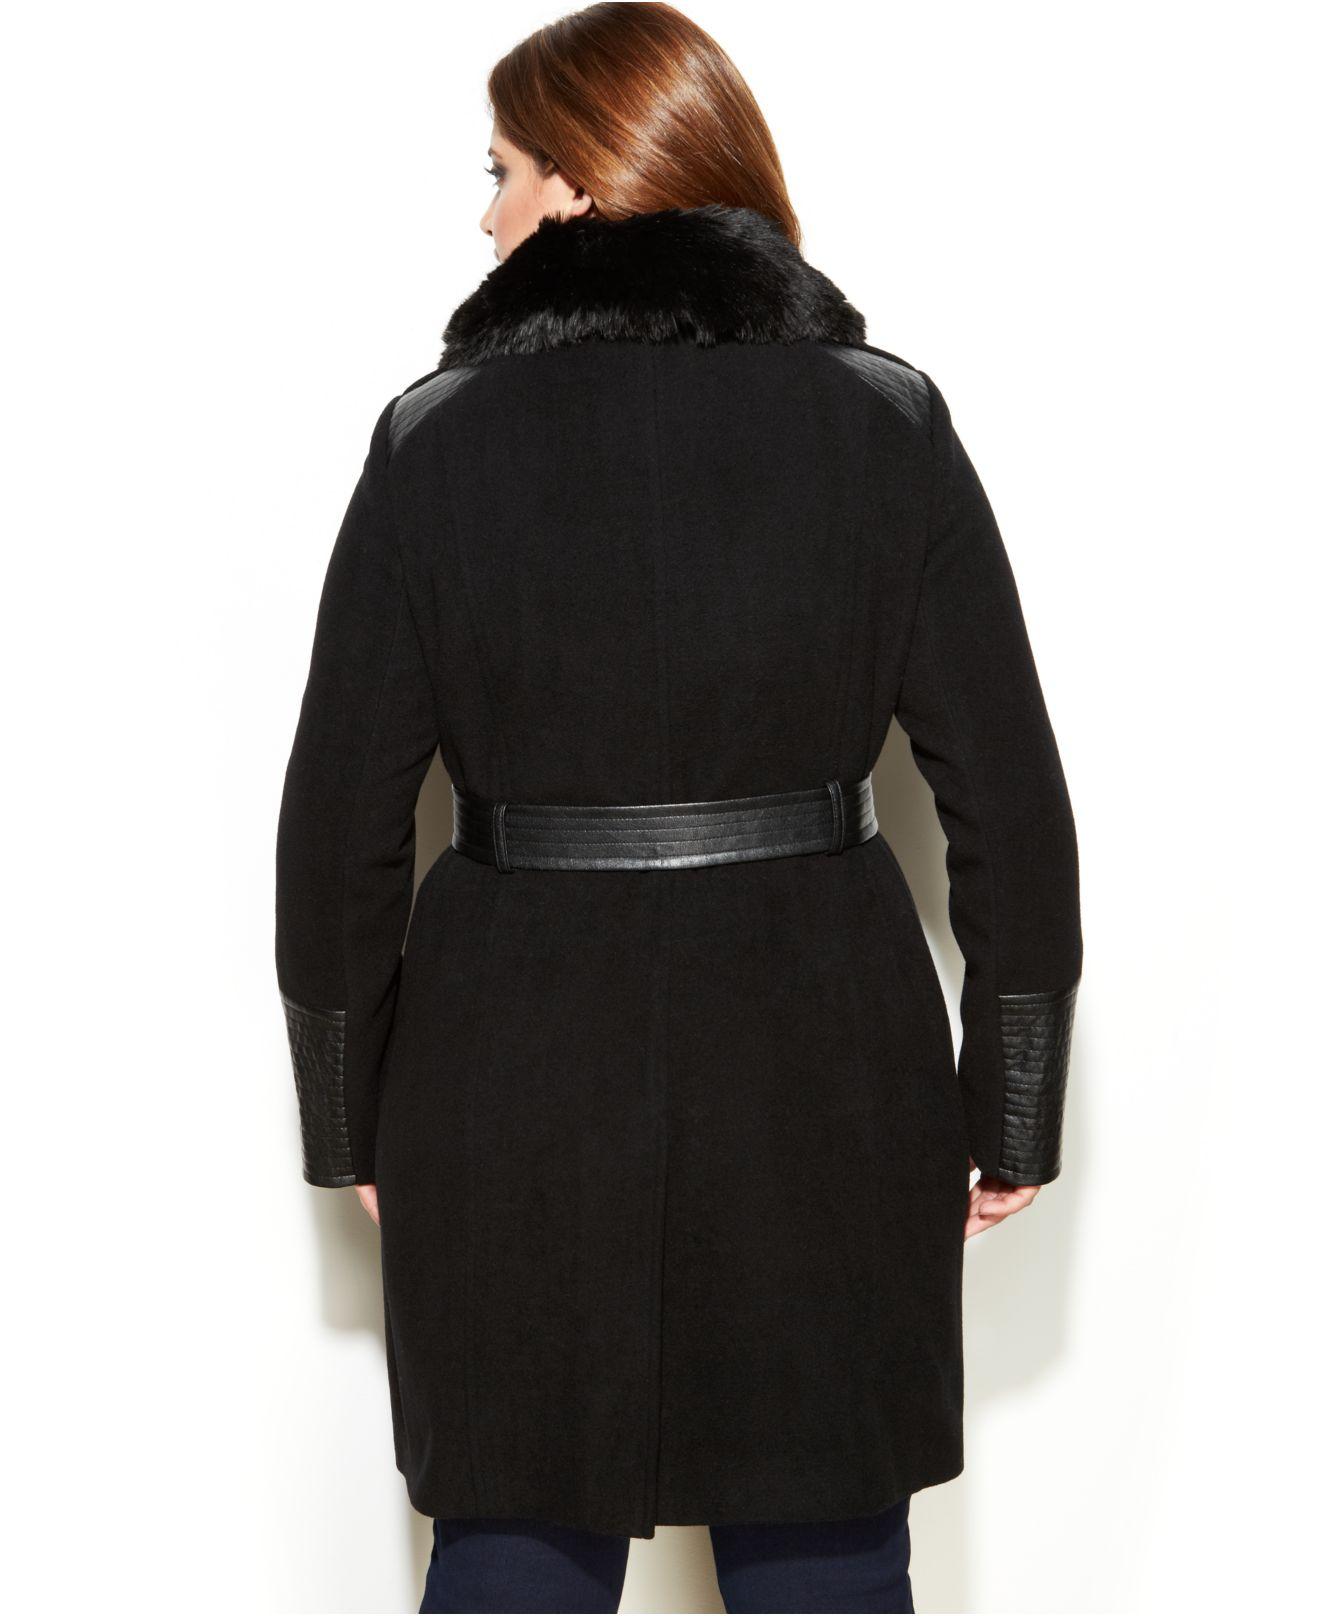 66ca263cb74 Lyst - Via Spiga Plus Size Mixed Media Faux-Fur-Trim Belted Wool ...